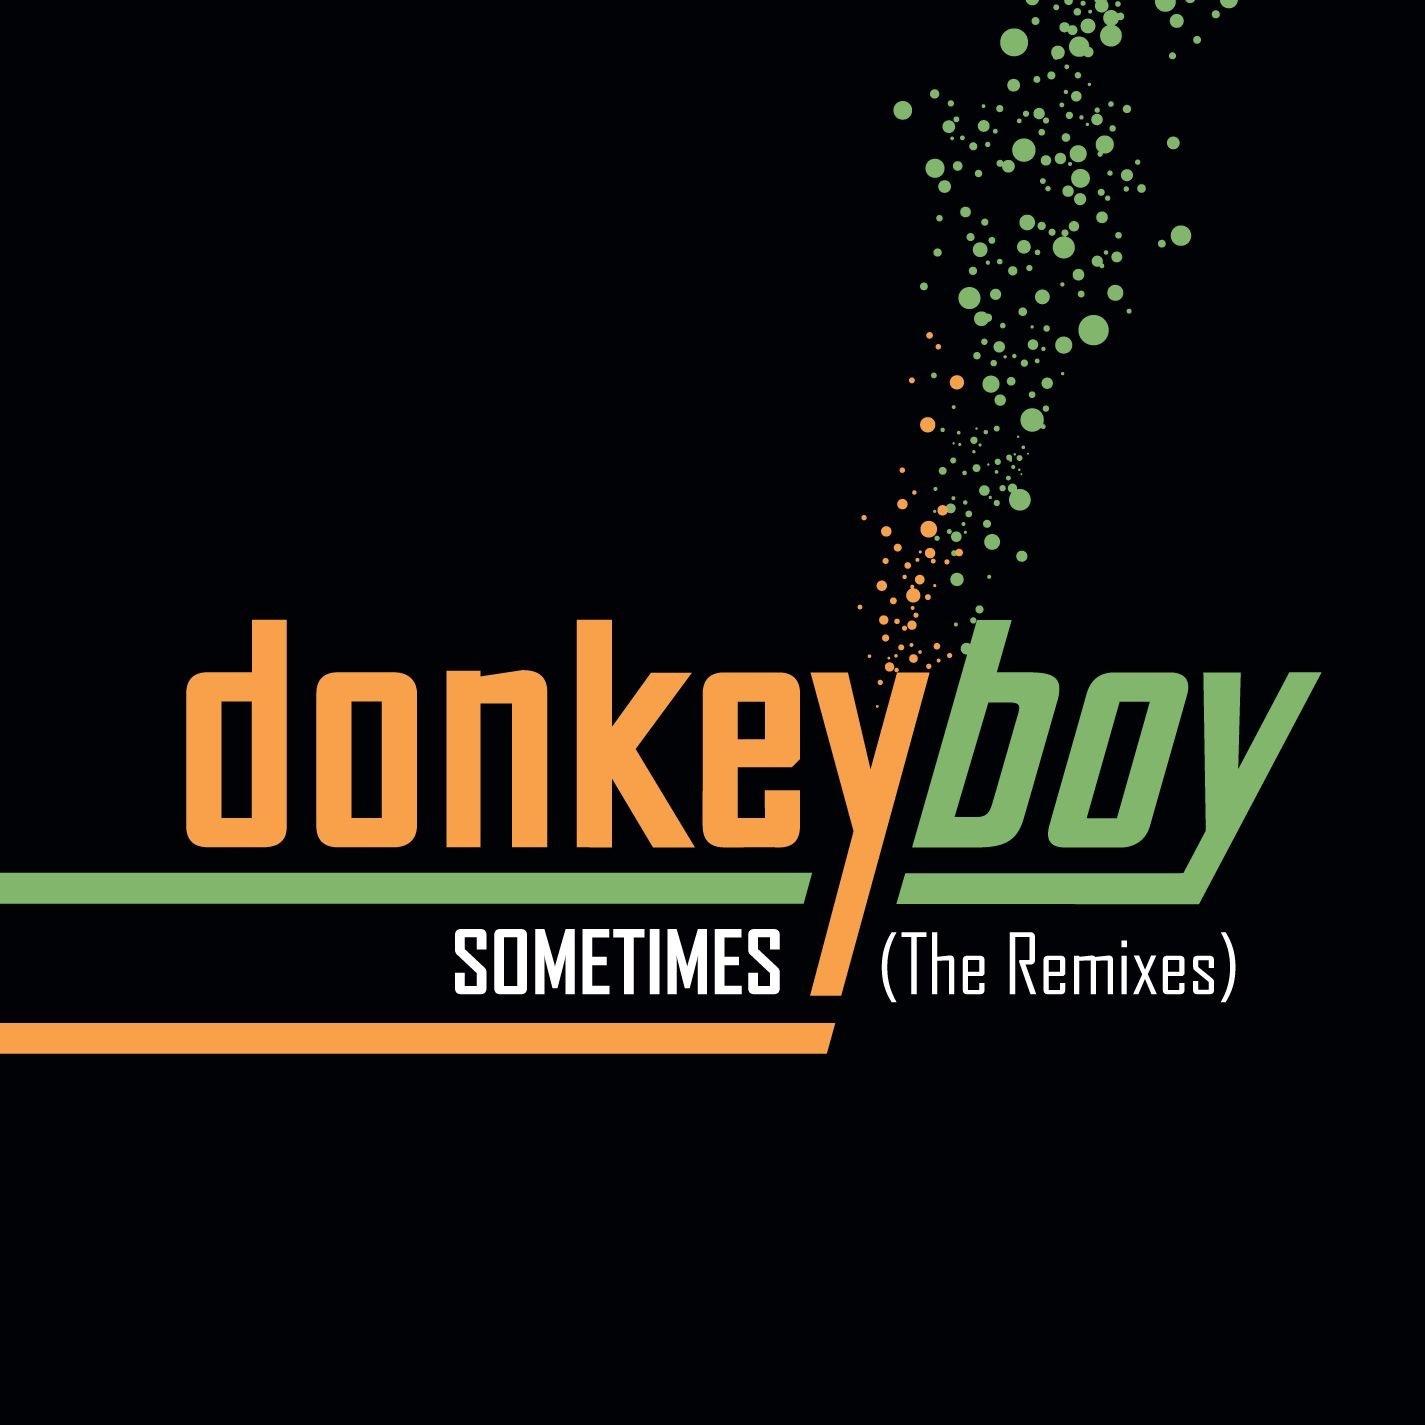 Donkeyboy album Sometimes - The Remixes